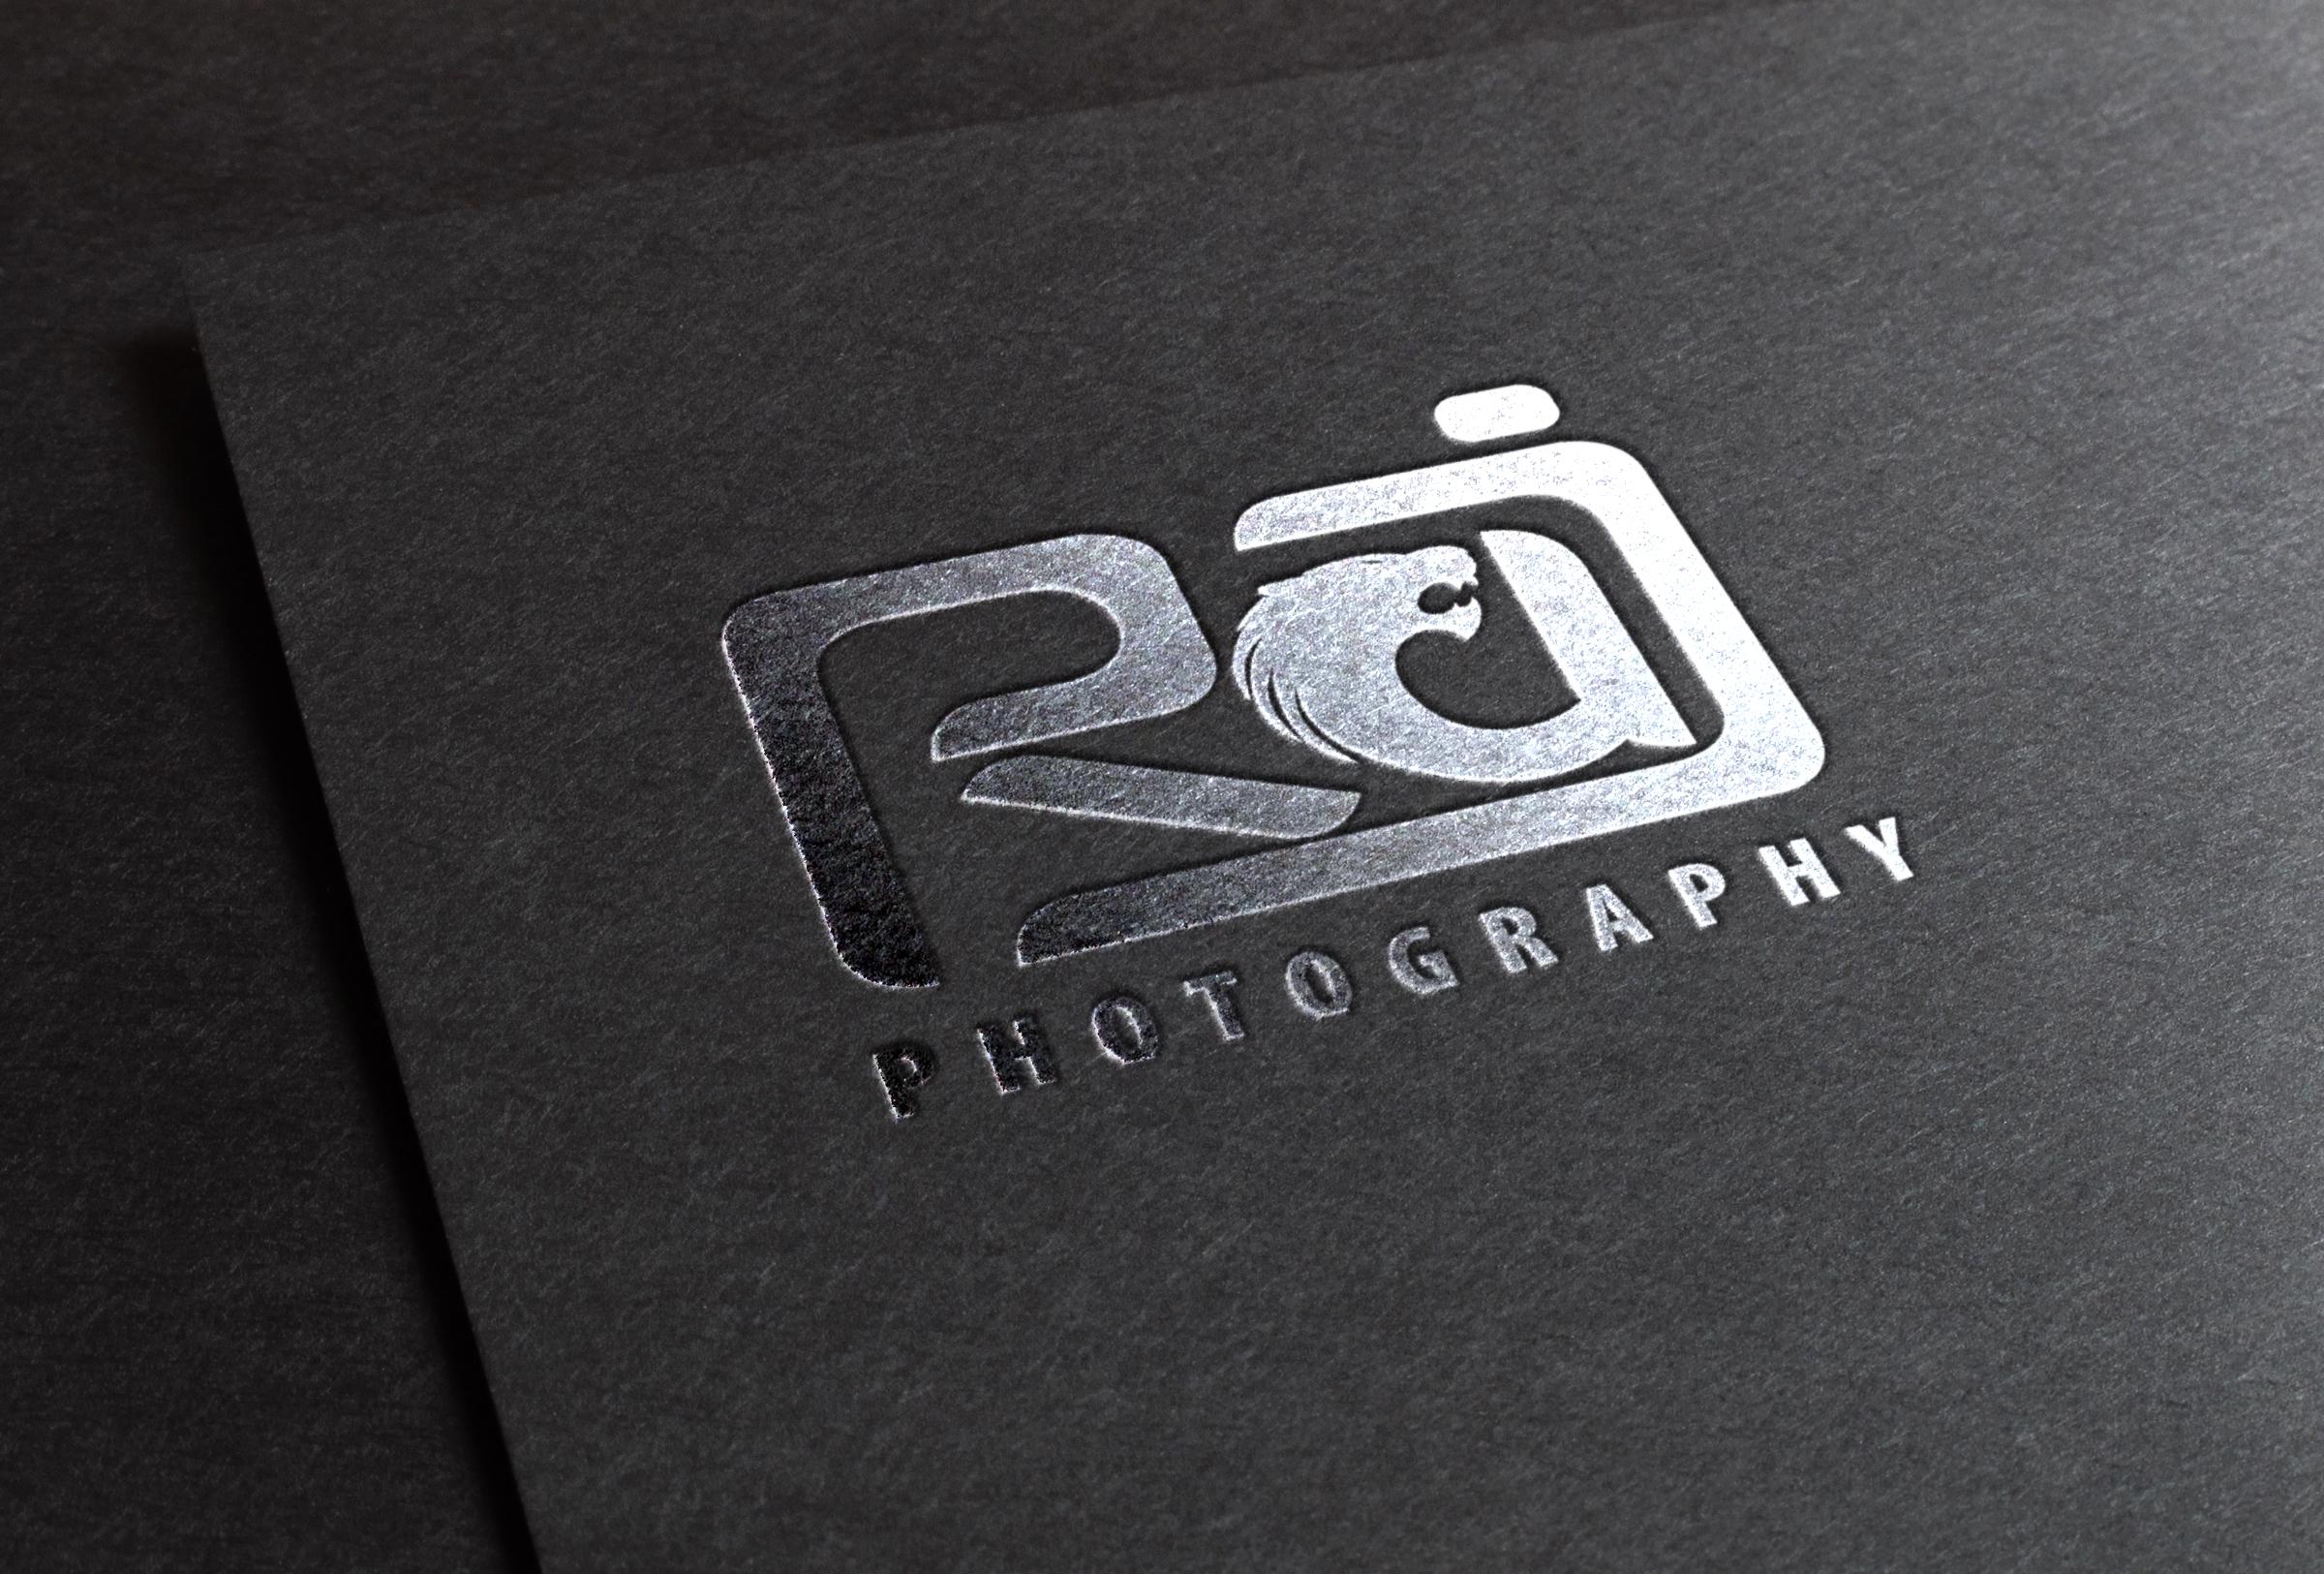 Raj wildlife photography logo design by Badri design